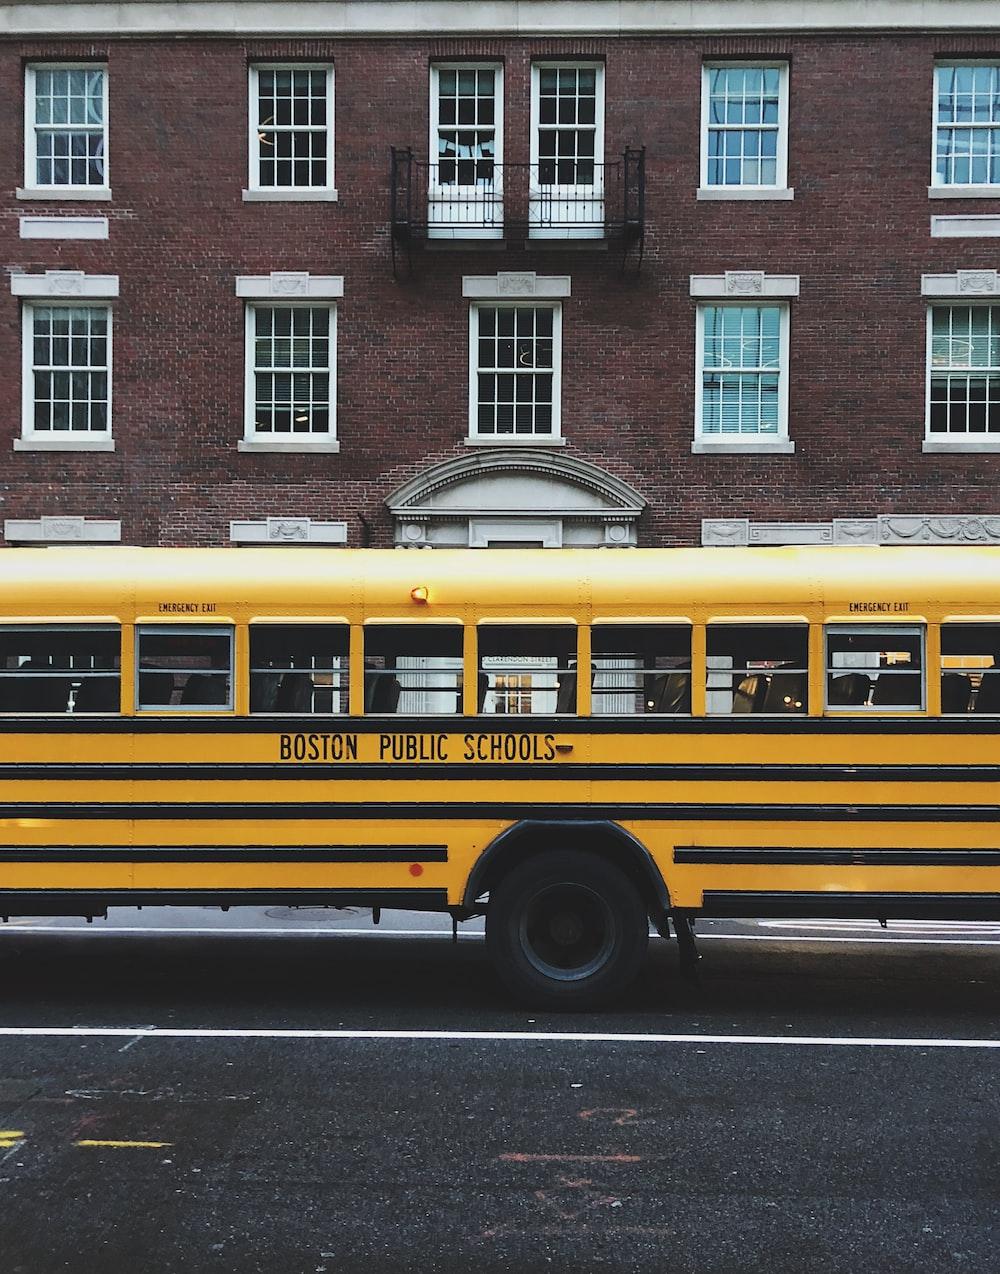 yellow Boston Public School bus